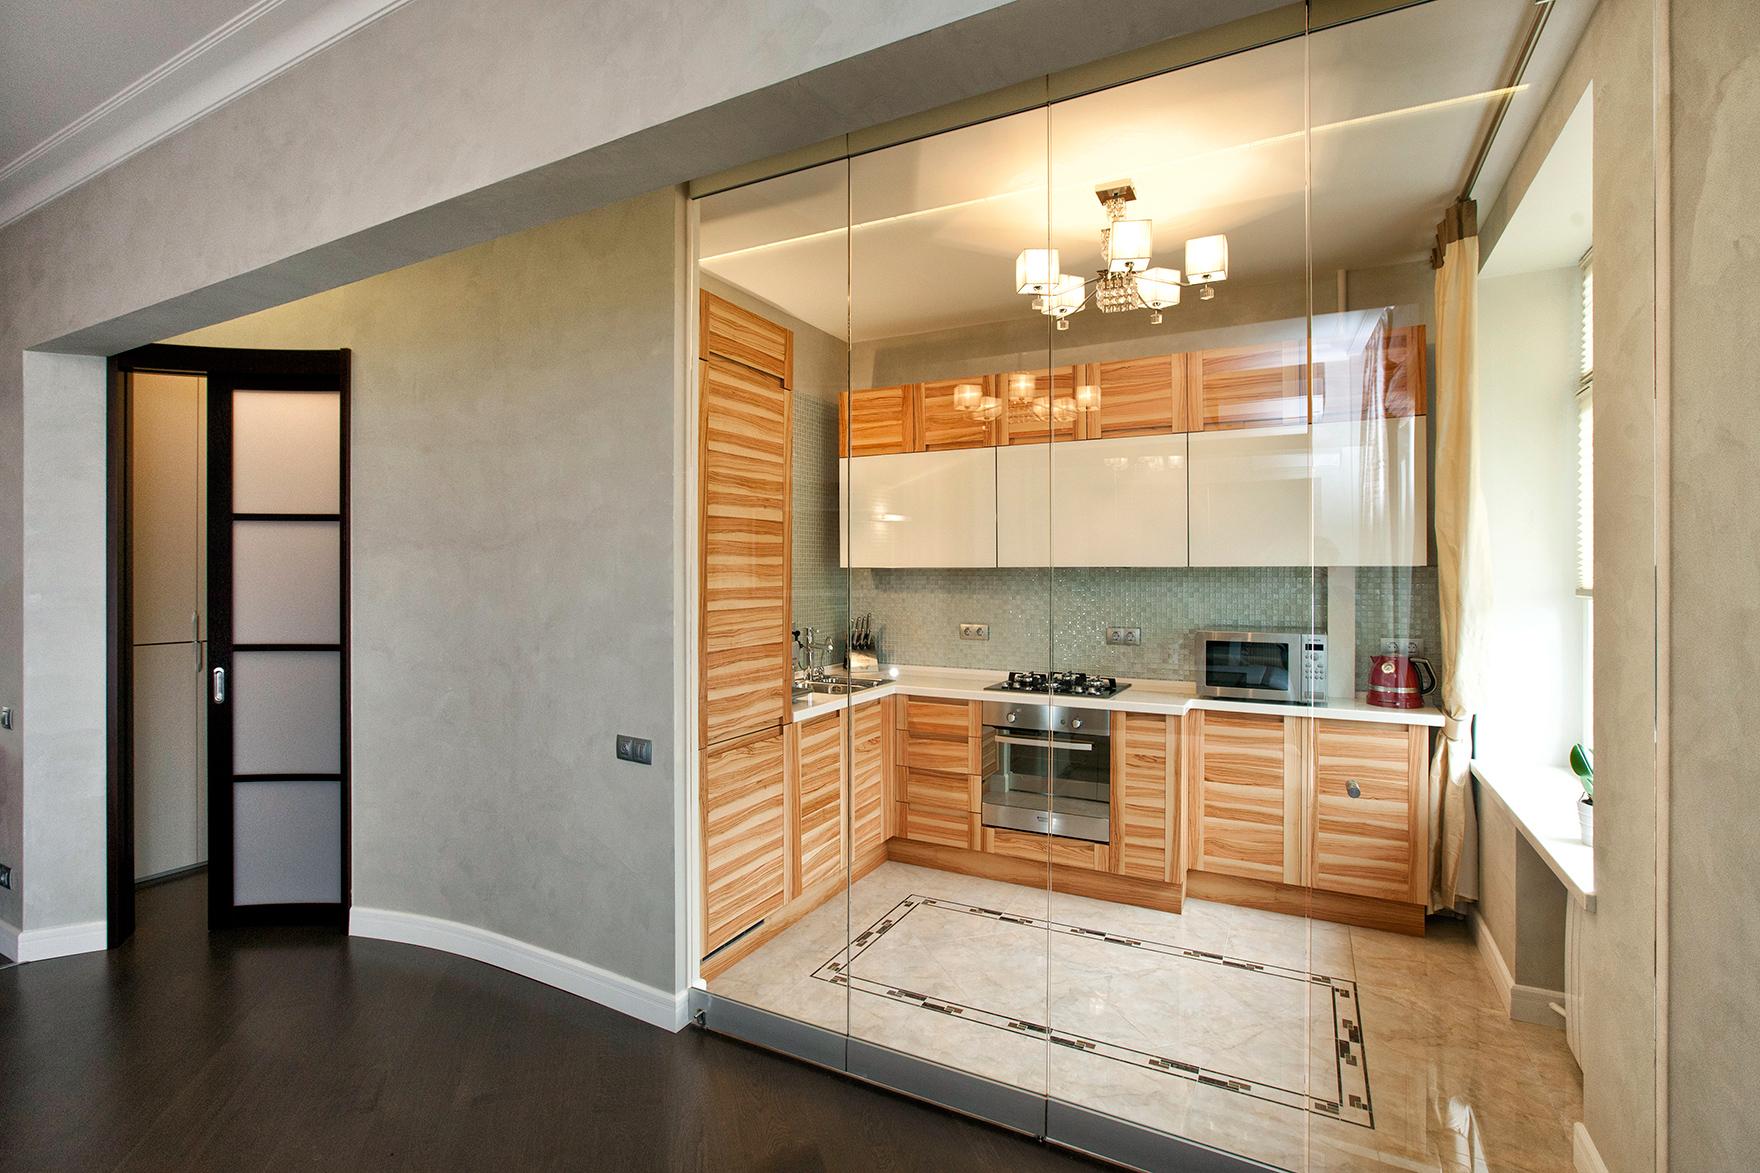 Дизайн квартир фото двухкомнатных квартир 70 кв.м